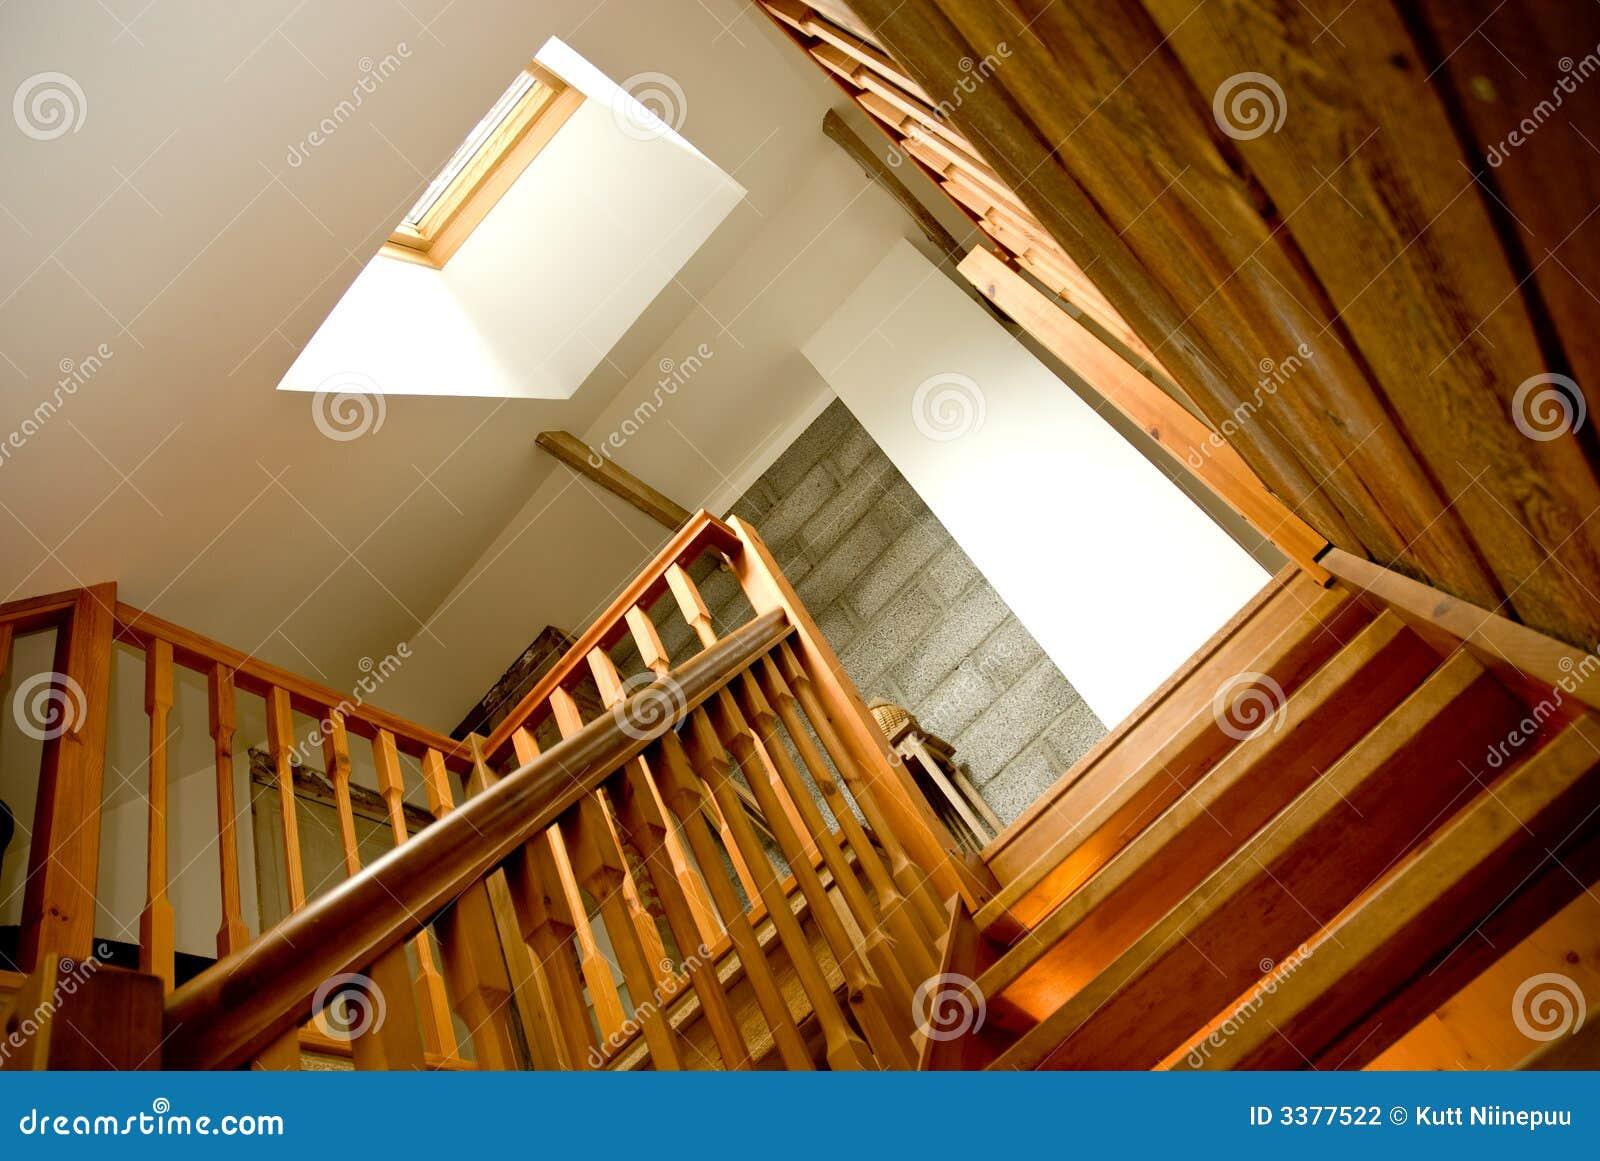 Escalera de madera de interior fotograf a de archivo - Escaleras de madera para interior ...